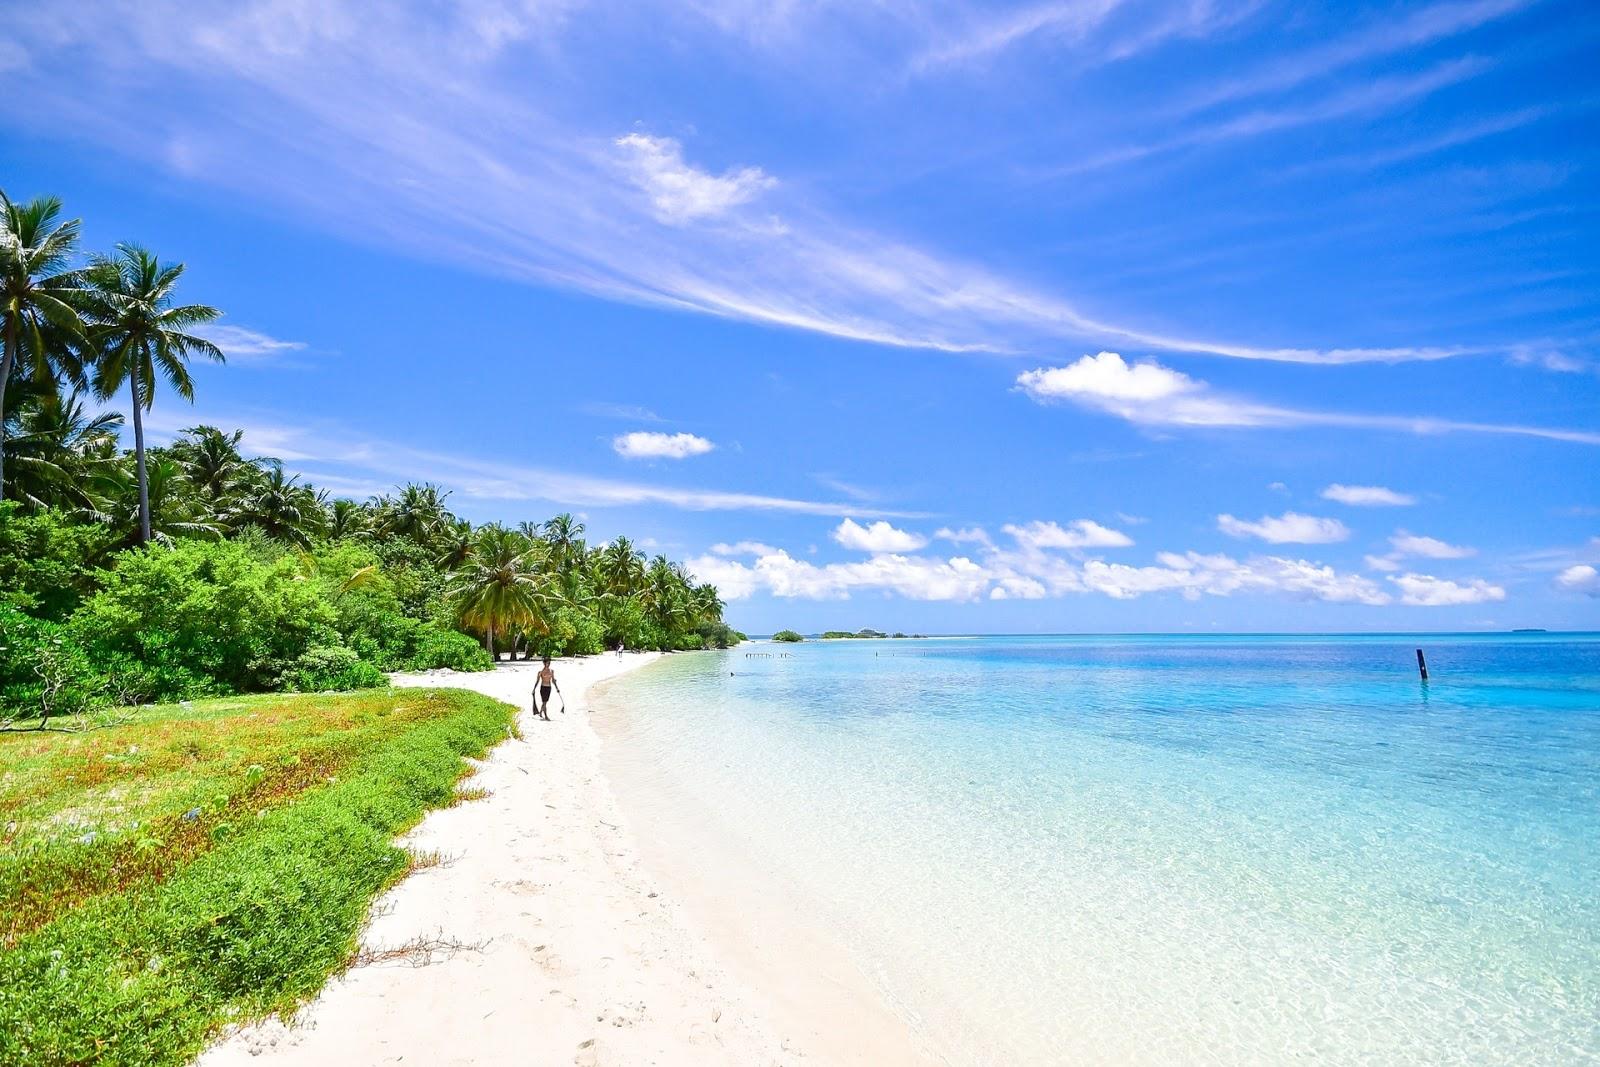 14 Gambar Pemandangan Pantai Indah Alami - Gambar Indah